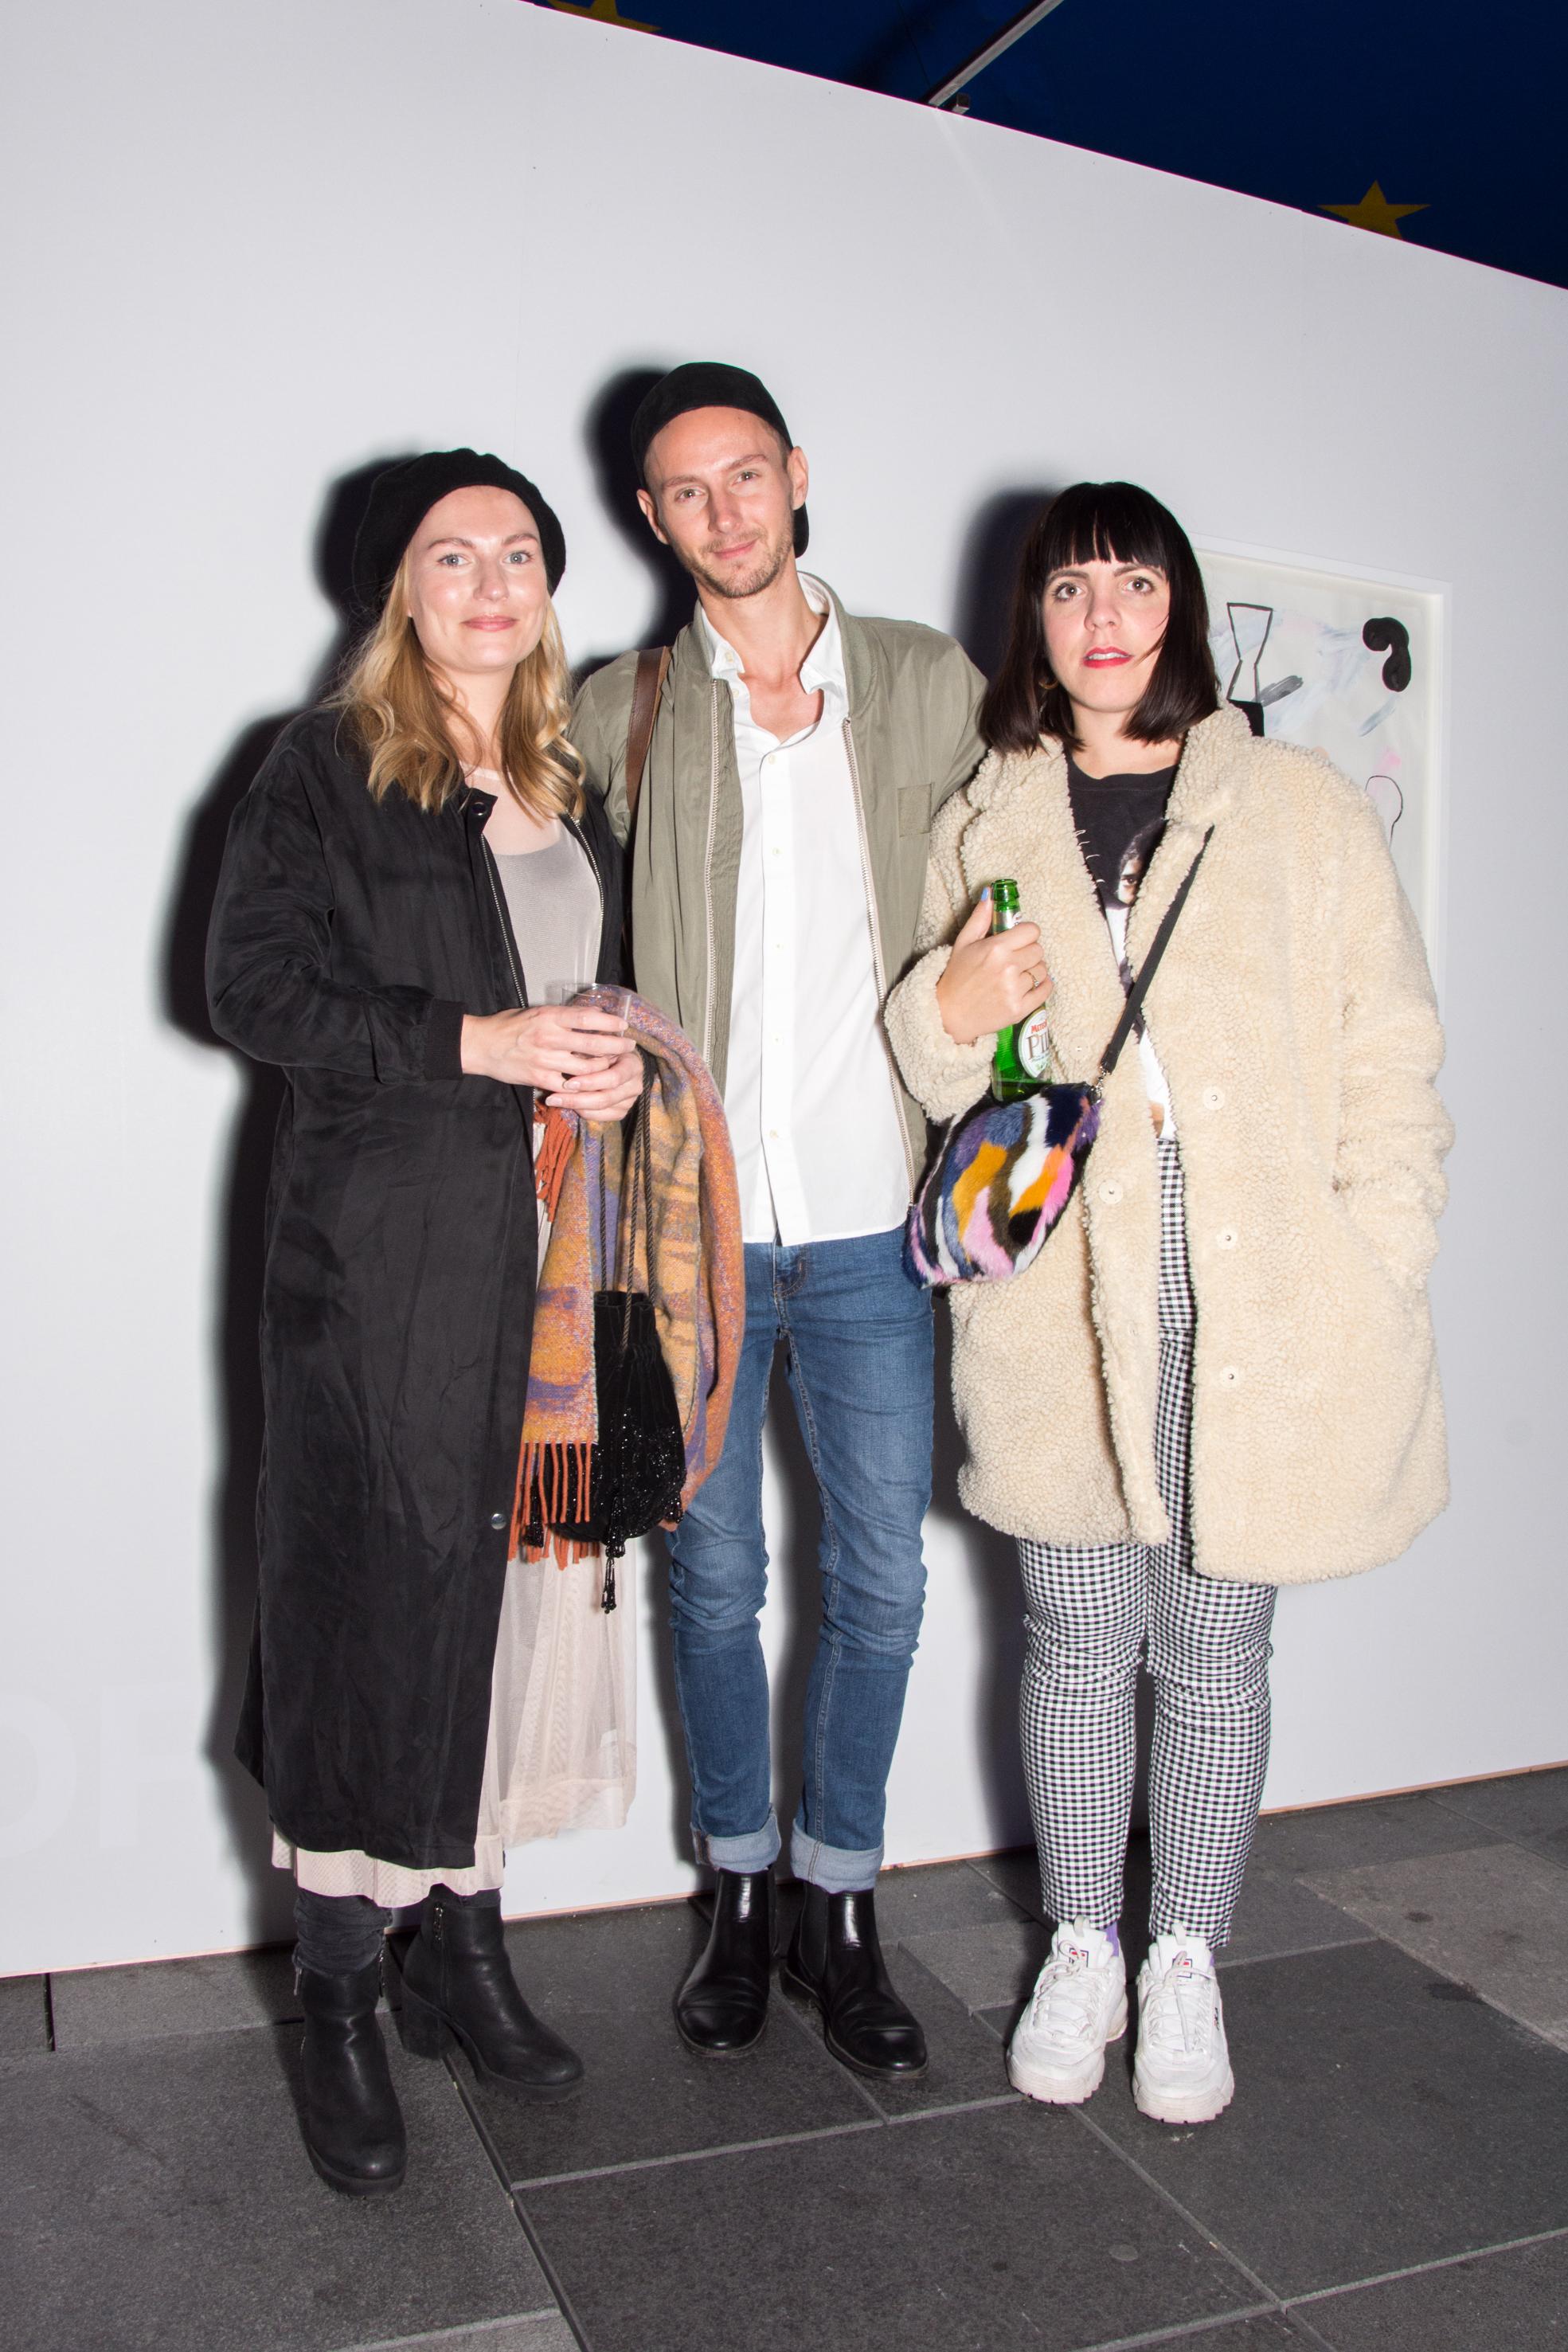 Tre personer på utstillingen